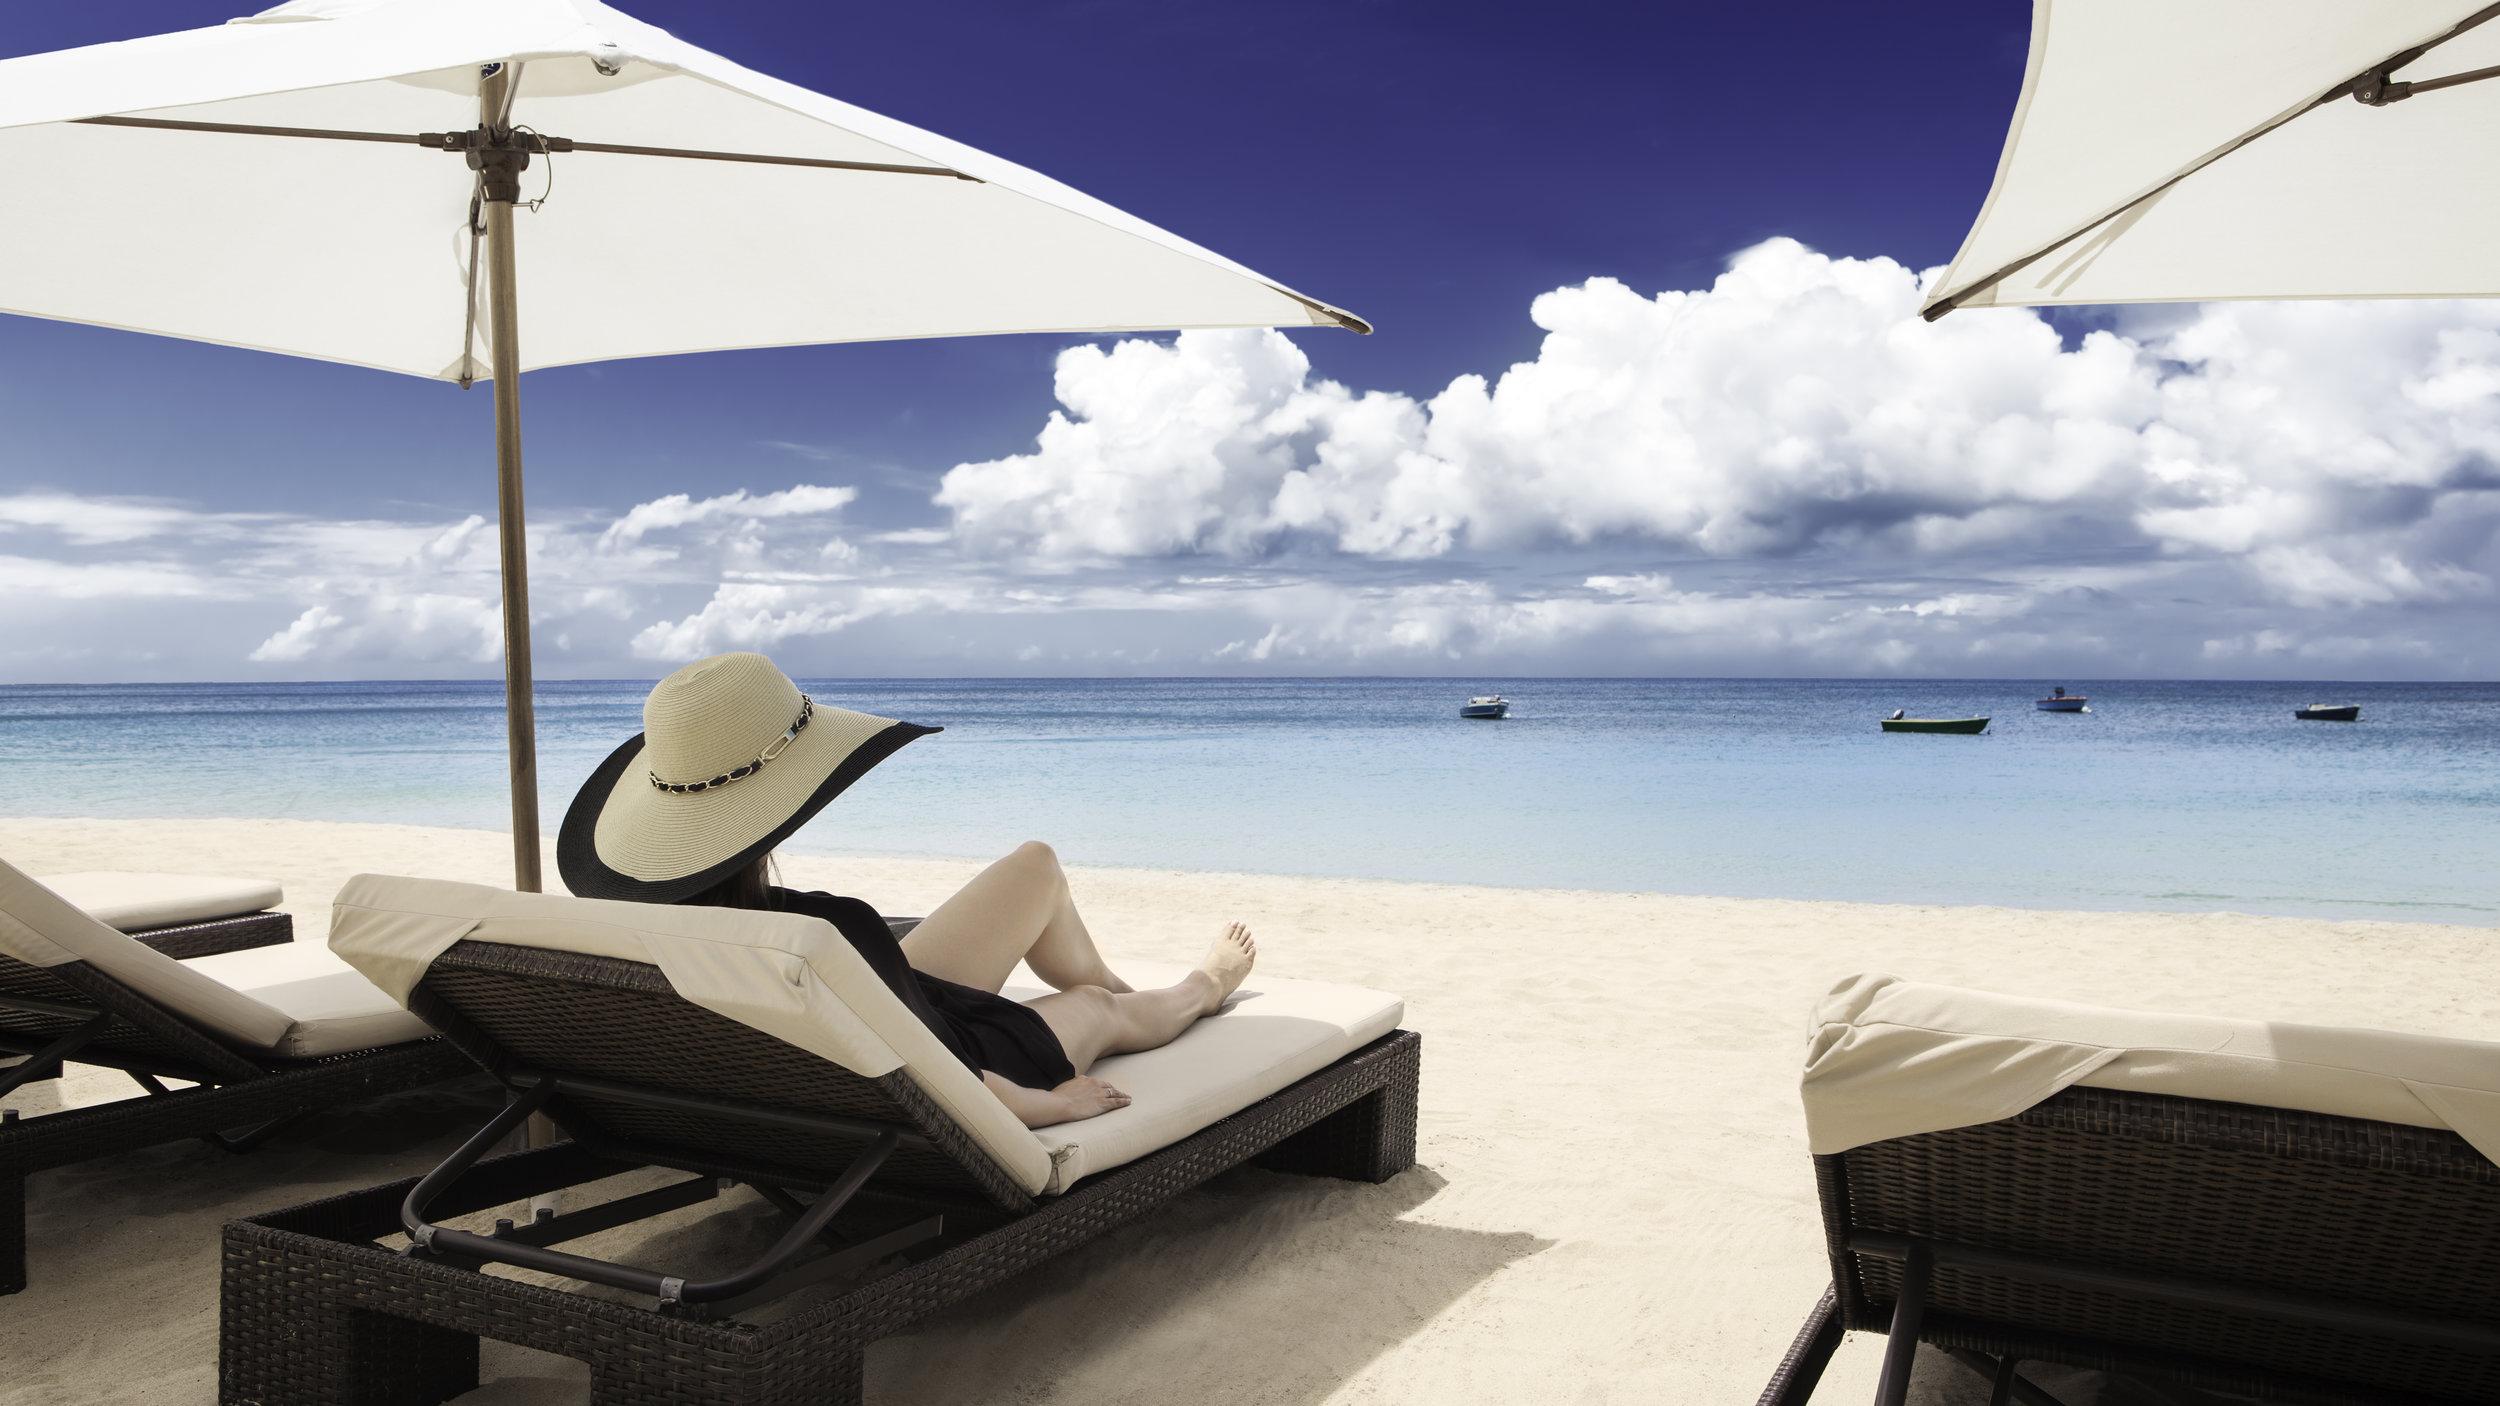 Inspirato_Destination_Anguilla_Lifestyle_BeachLounge.jpg